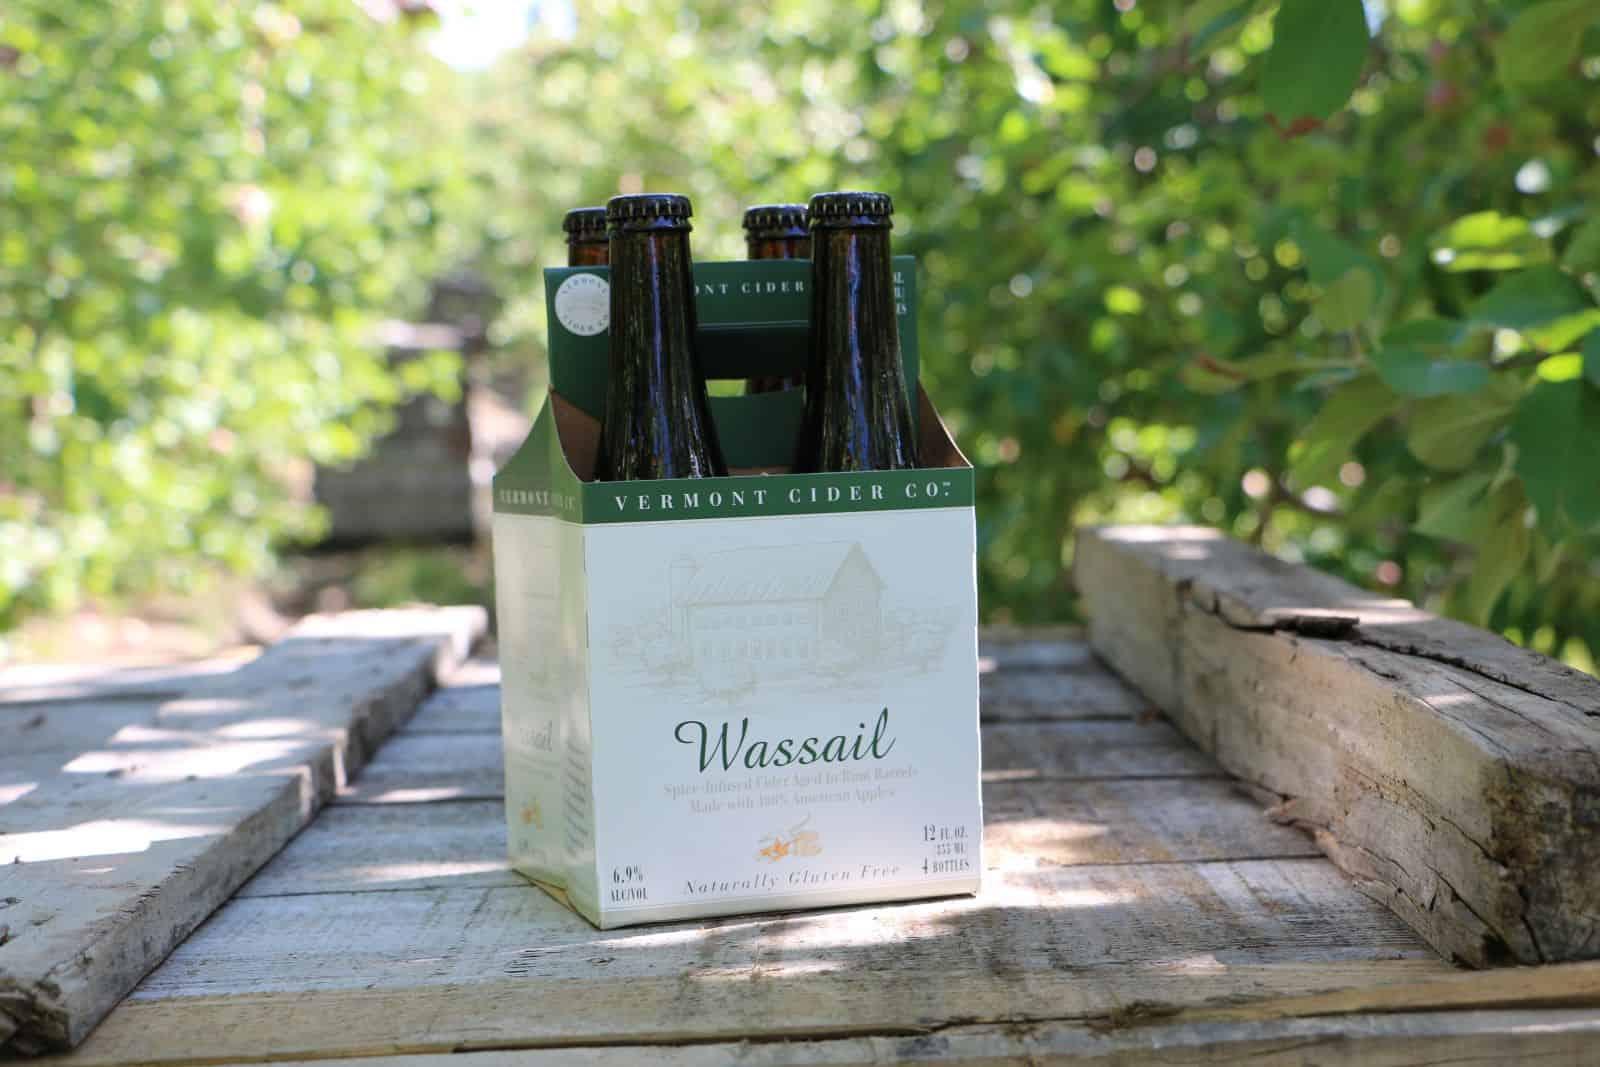 vermont-cider-company-wassail